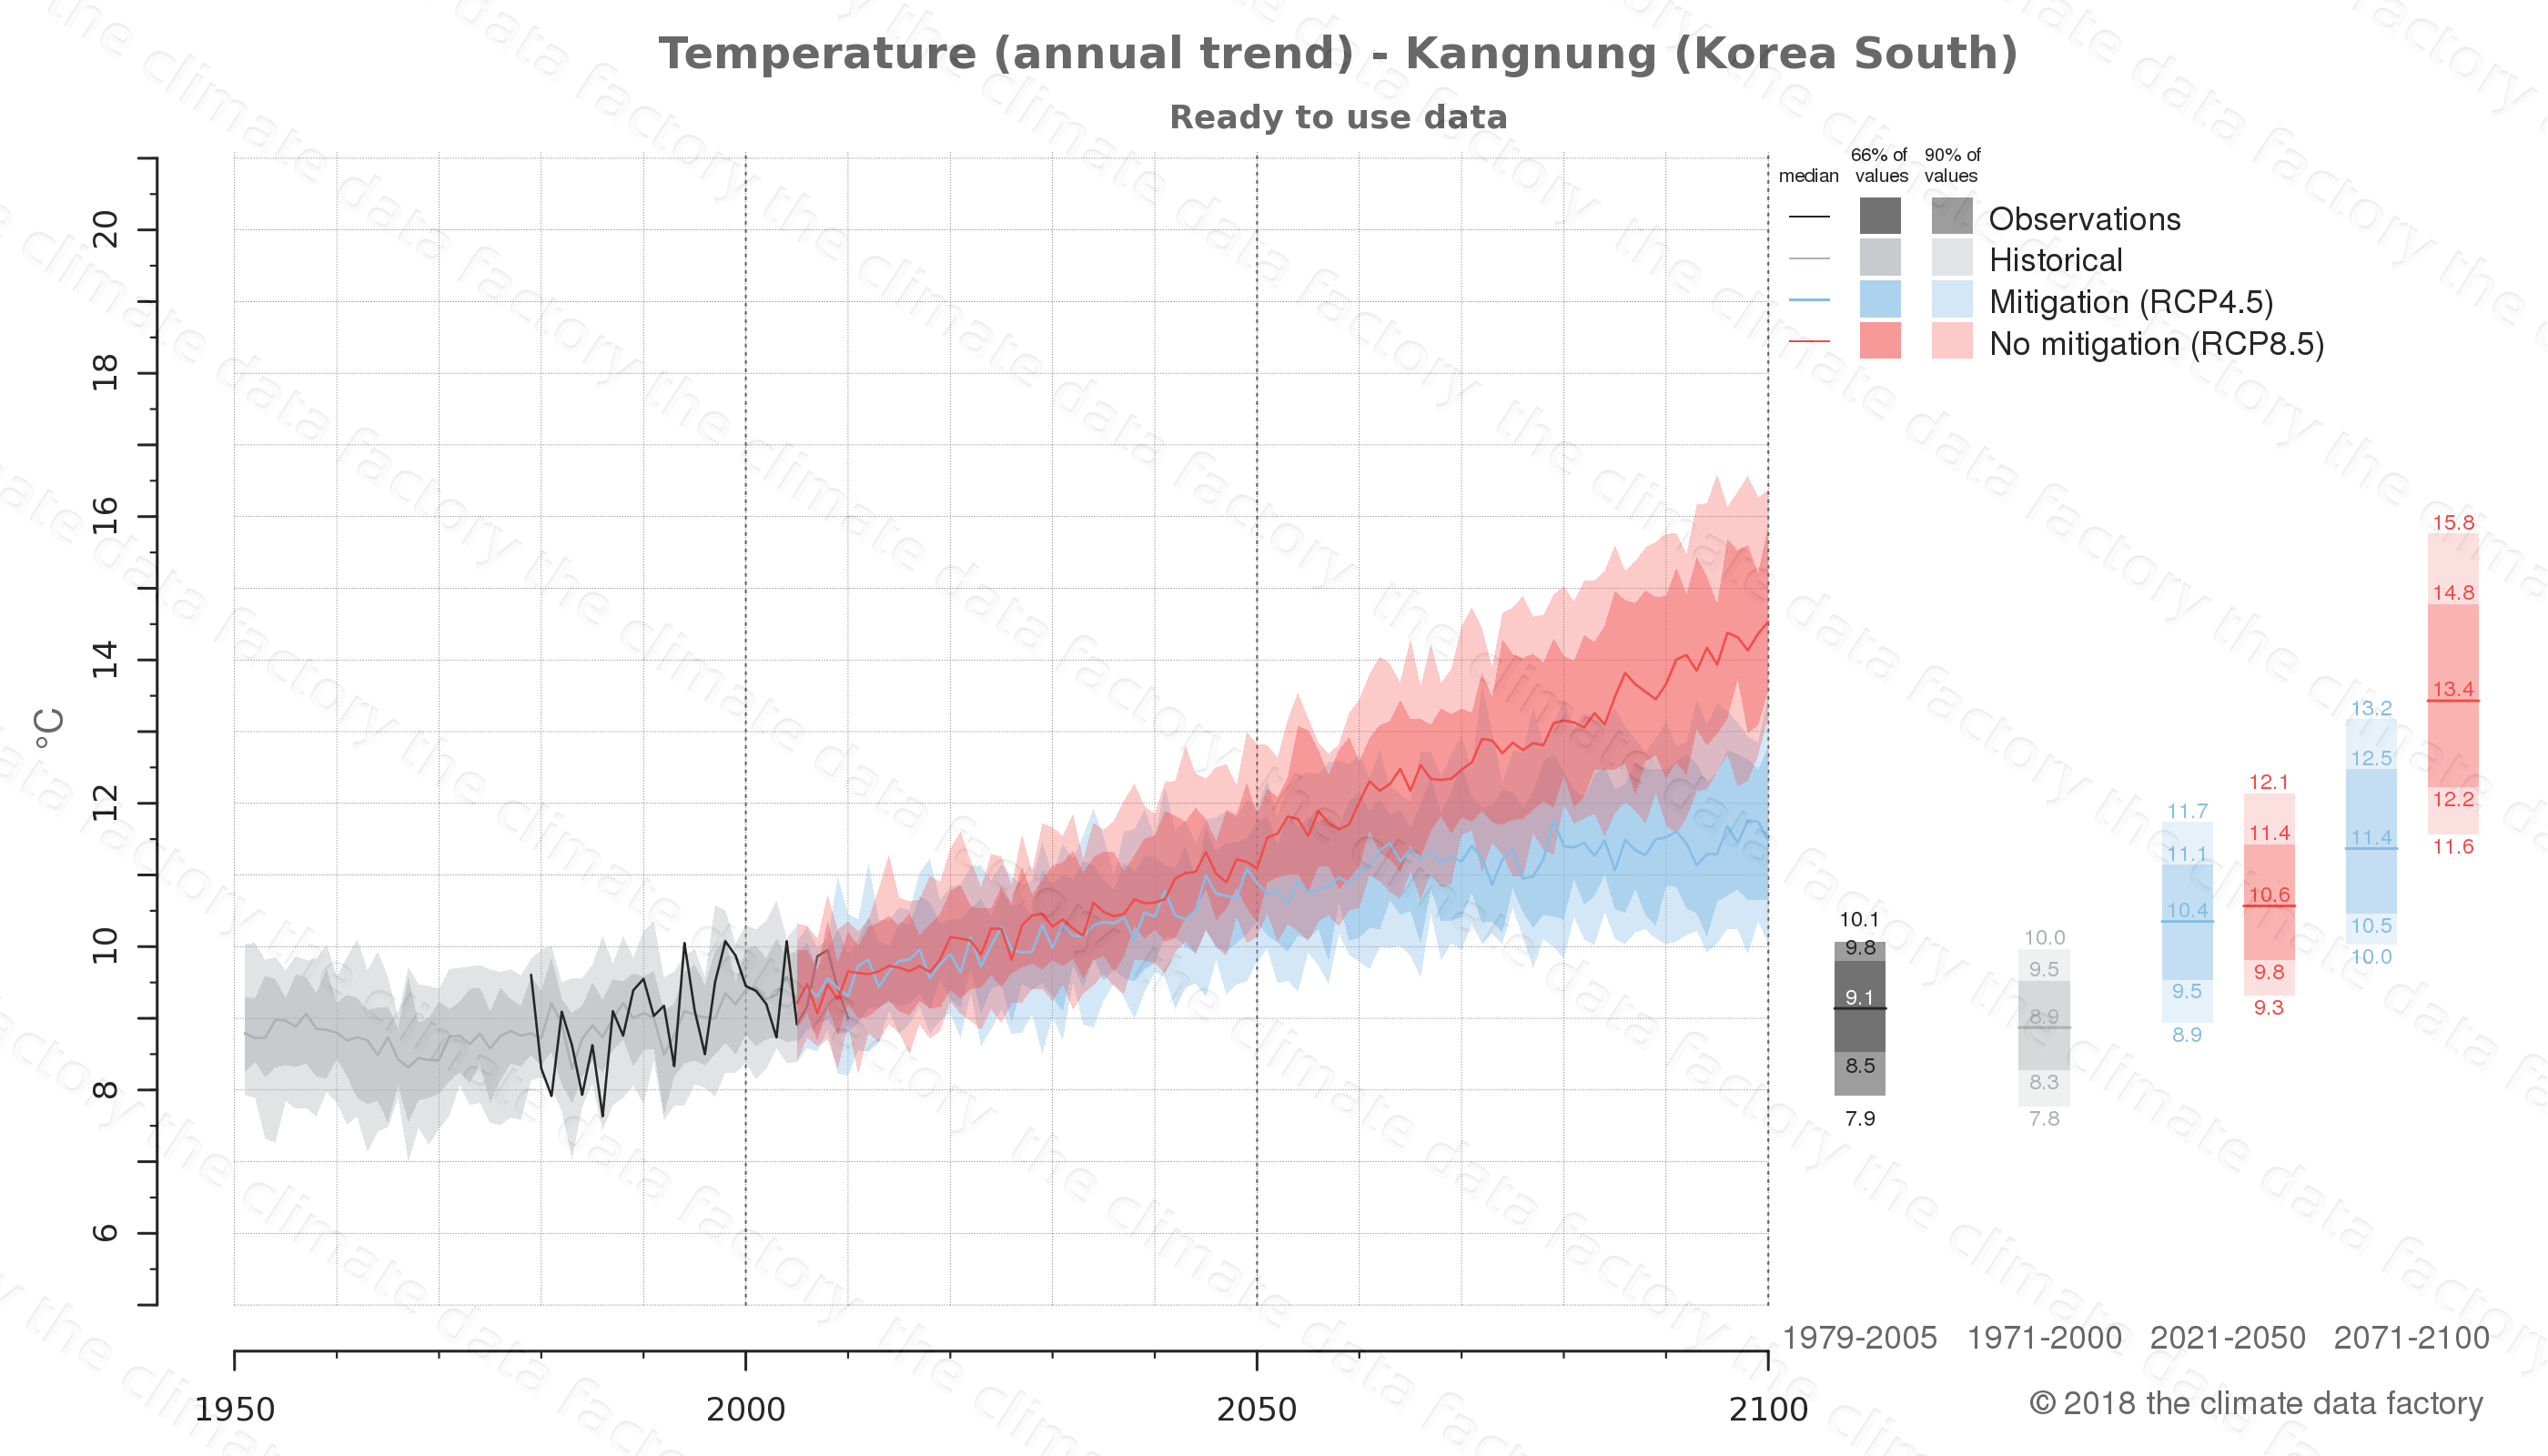 climate change data policy adaptation climate graph city data temperature kangnung south korea